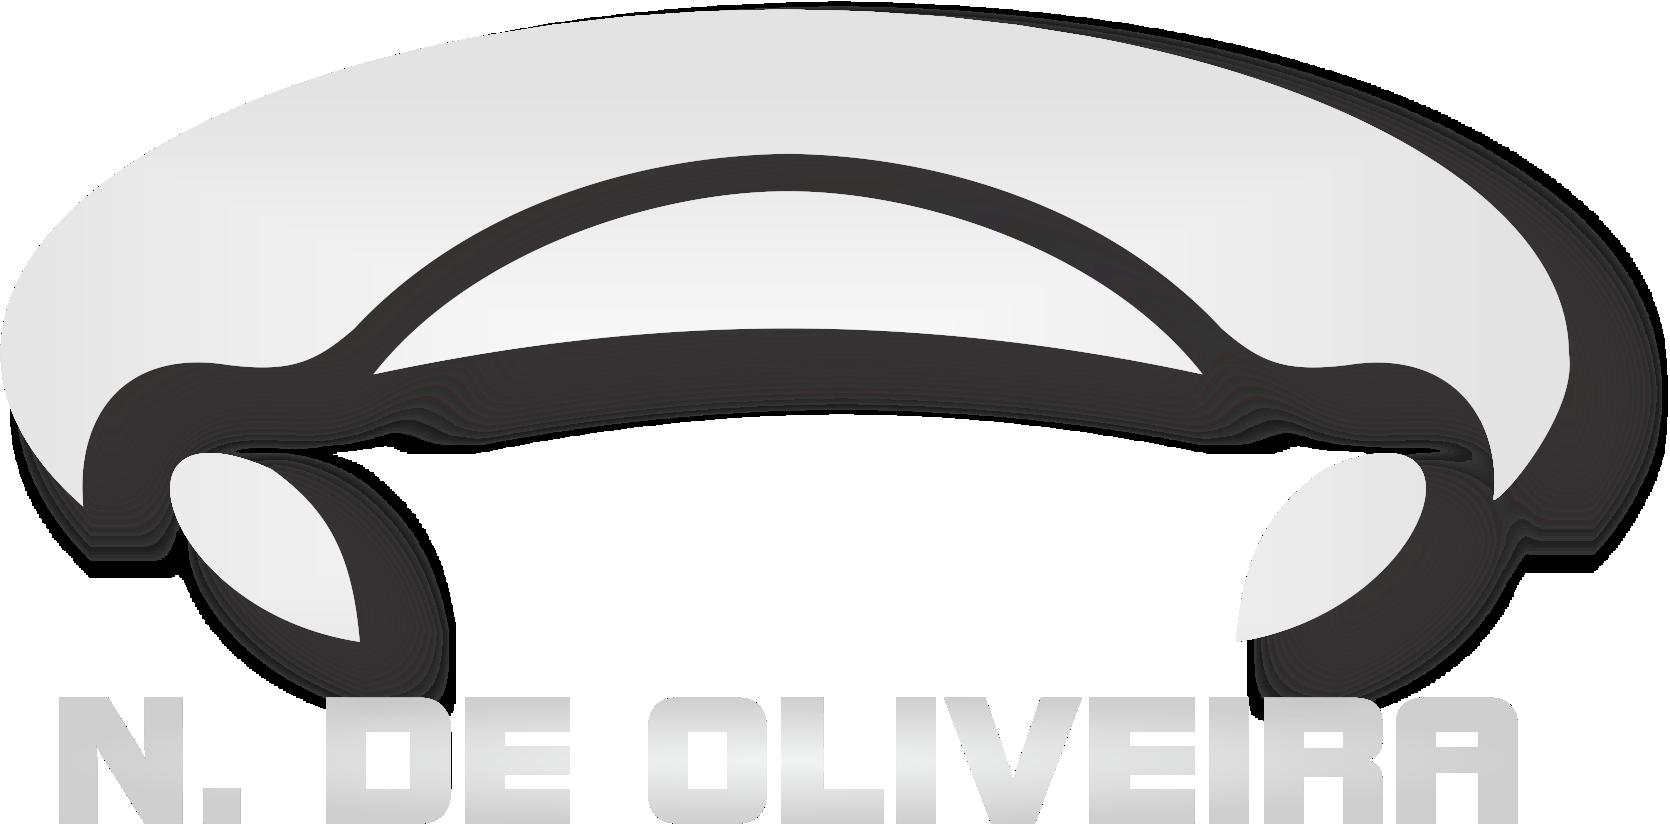 N. DE OLIVEIRA